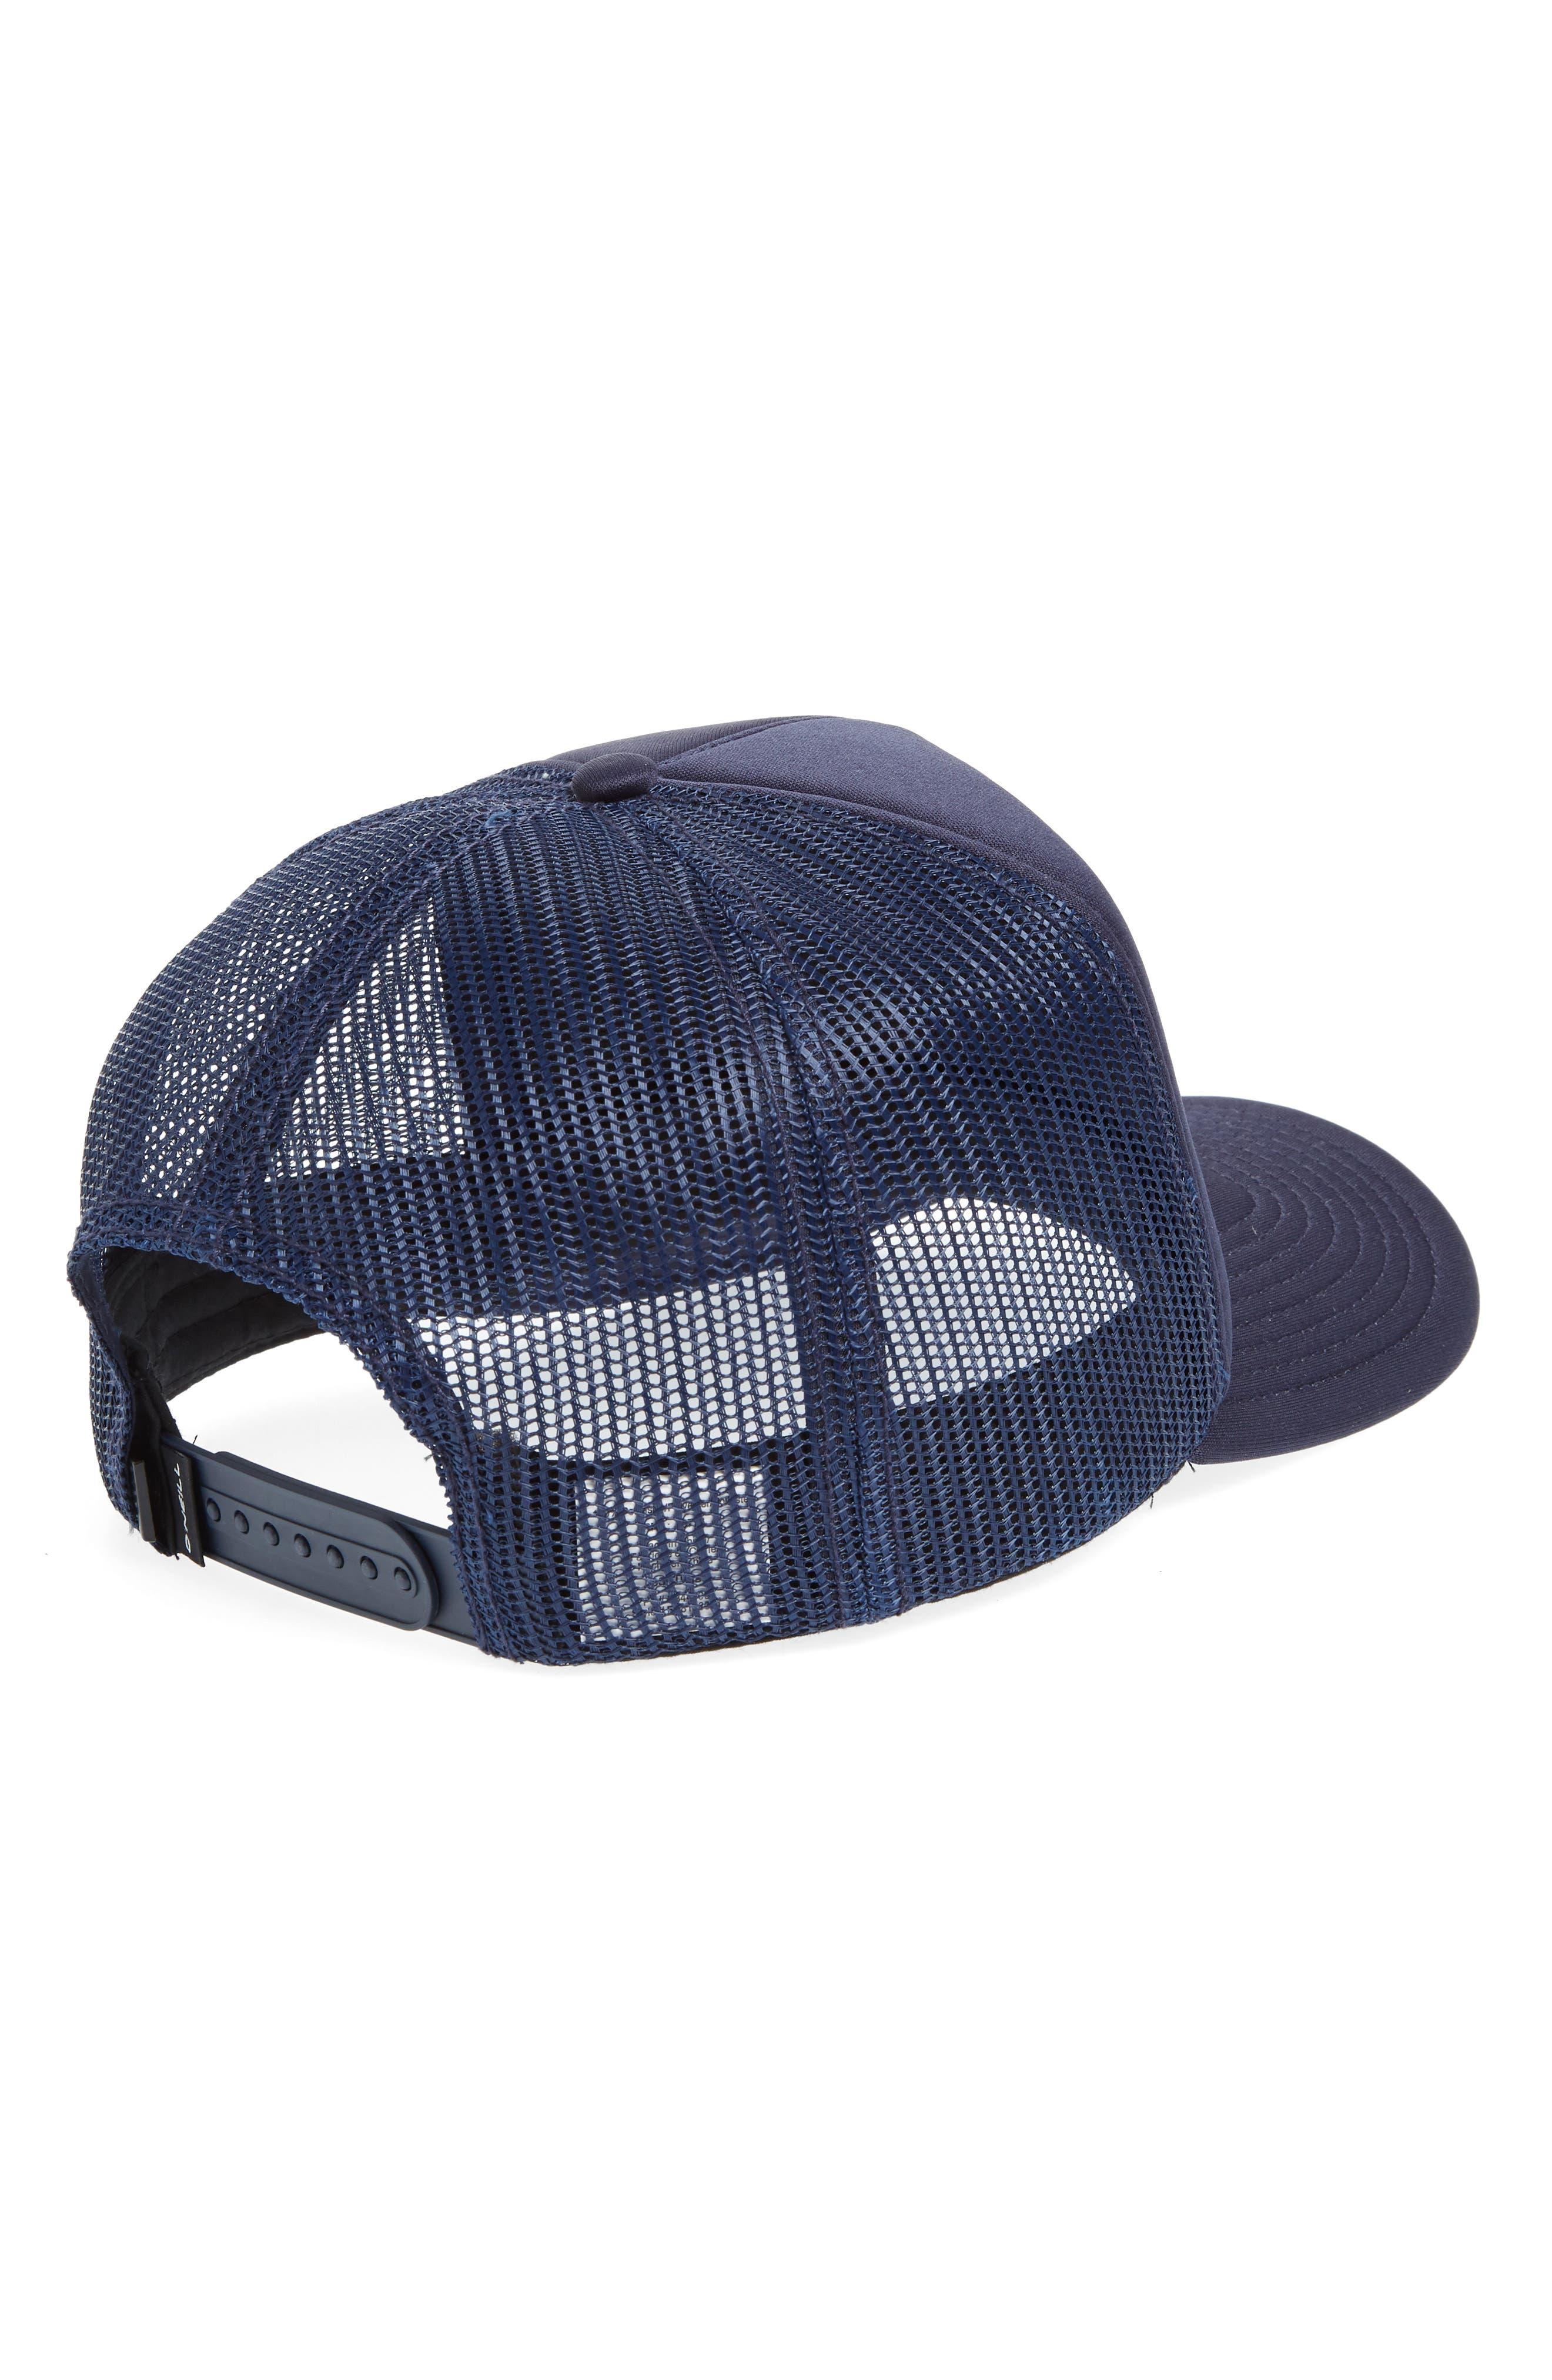 Yardsale Trucker Hat,                             Alternate thumbnail 2, color,                             Navy